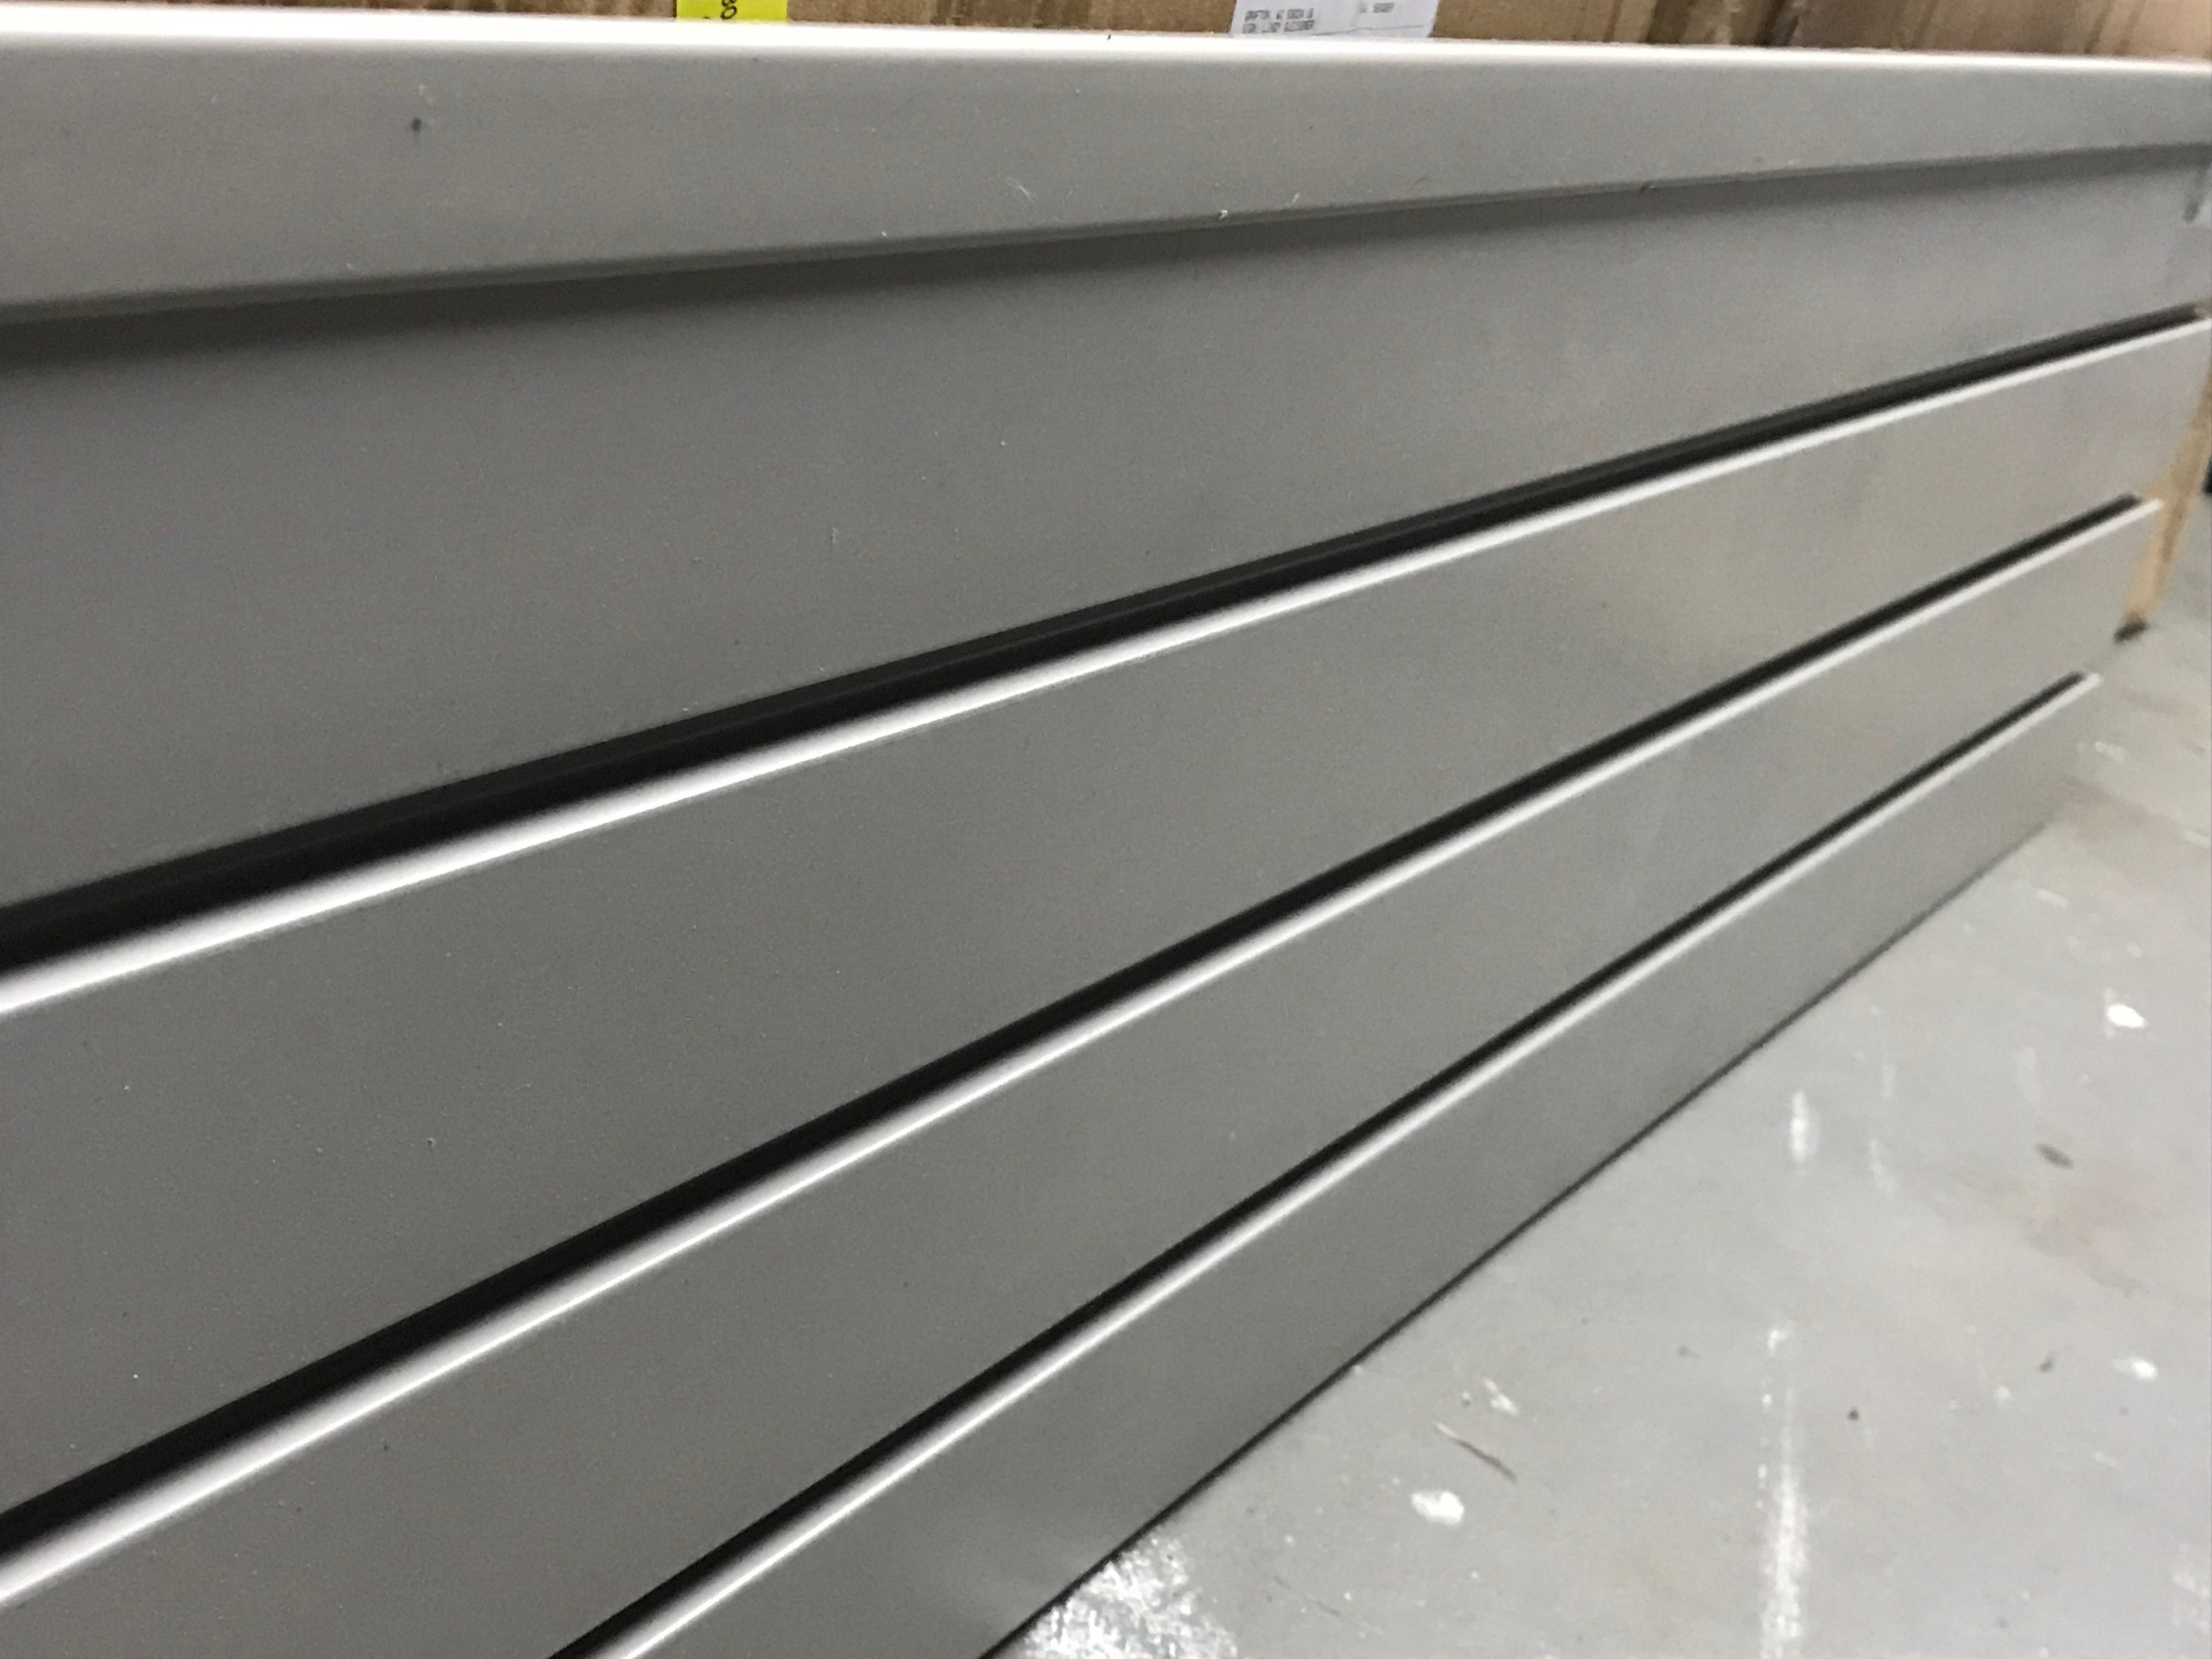 StoreWALL Standard Duty Wall Panel (1219mm) - Single Panel 00041